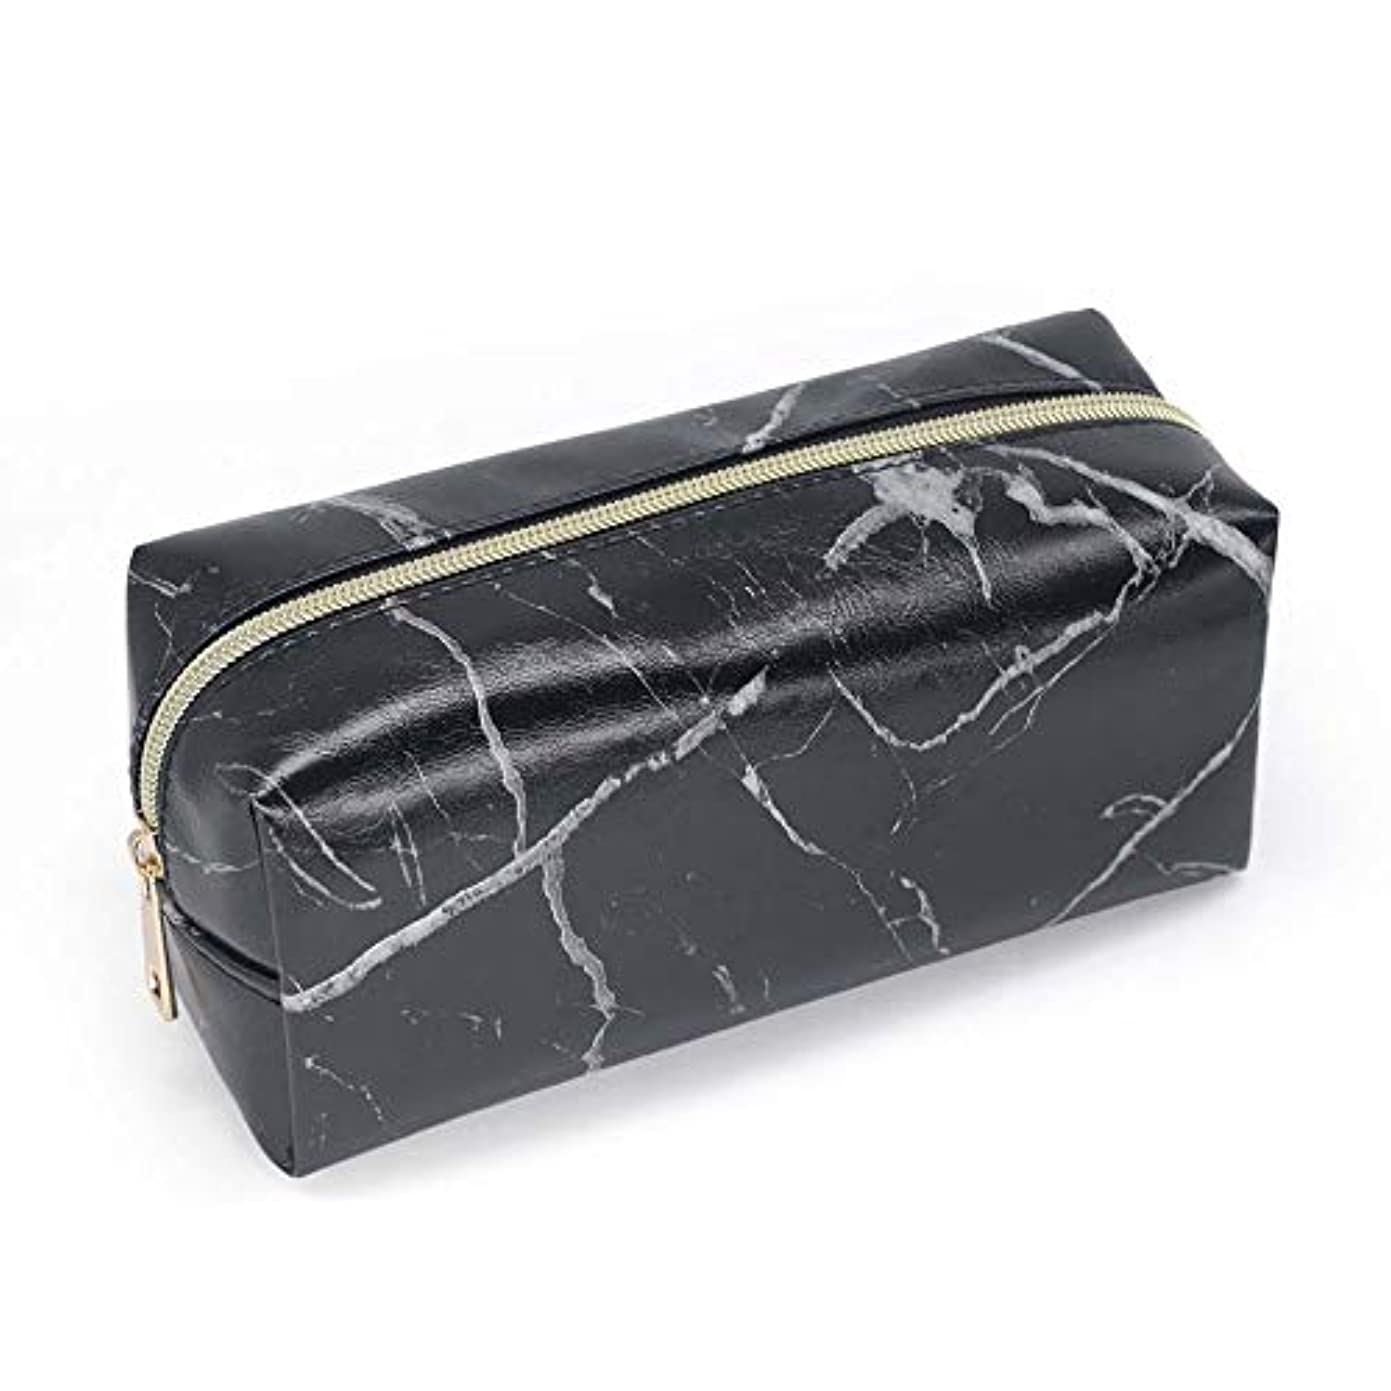 Tivivose 収納ケース メイクポーチ 大理石柄 大容量 化粧ポーチ コスメバッグ コスメポーチ メイクポーチ シンプル おしゃれ かわいい 化粧品 収納 雑貨 小物入れ